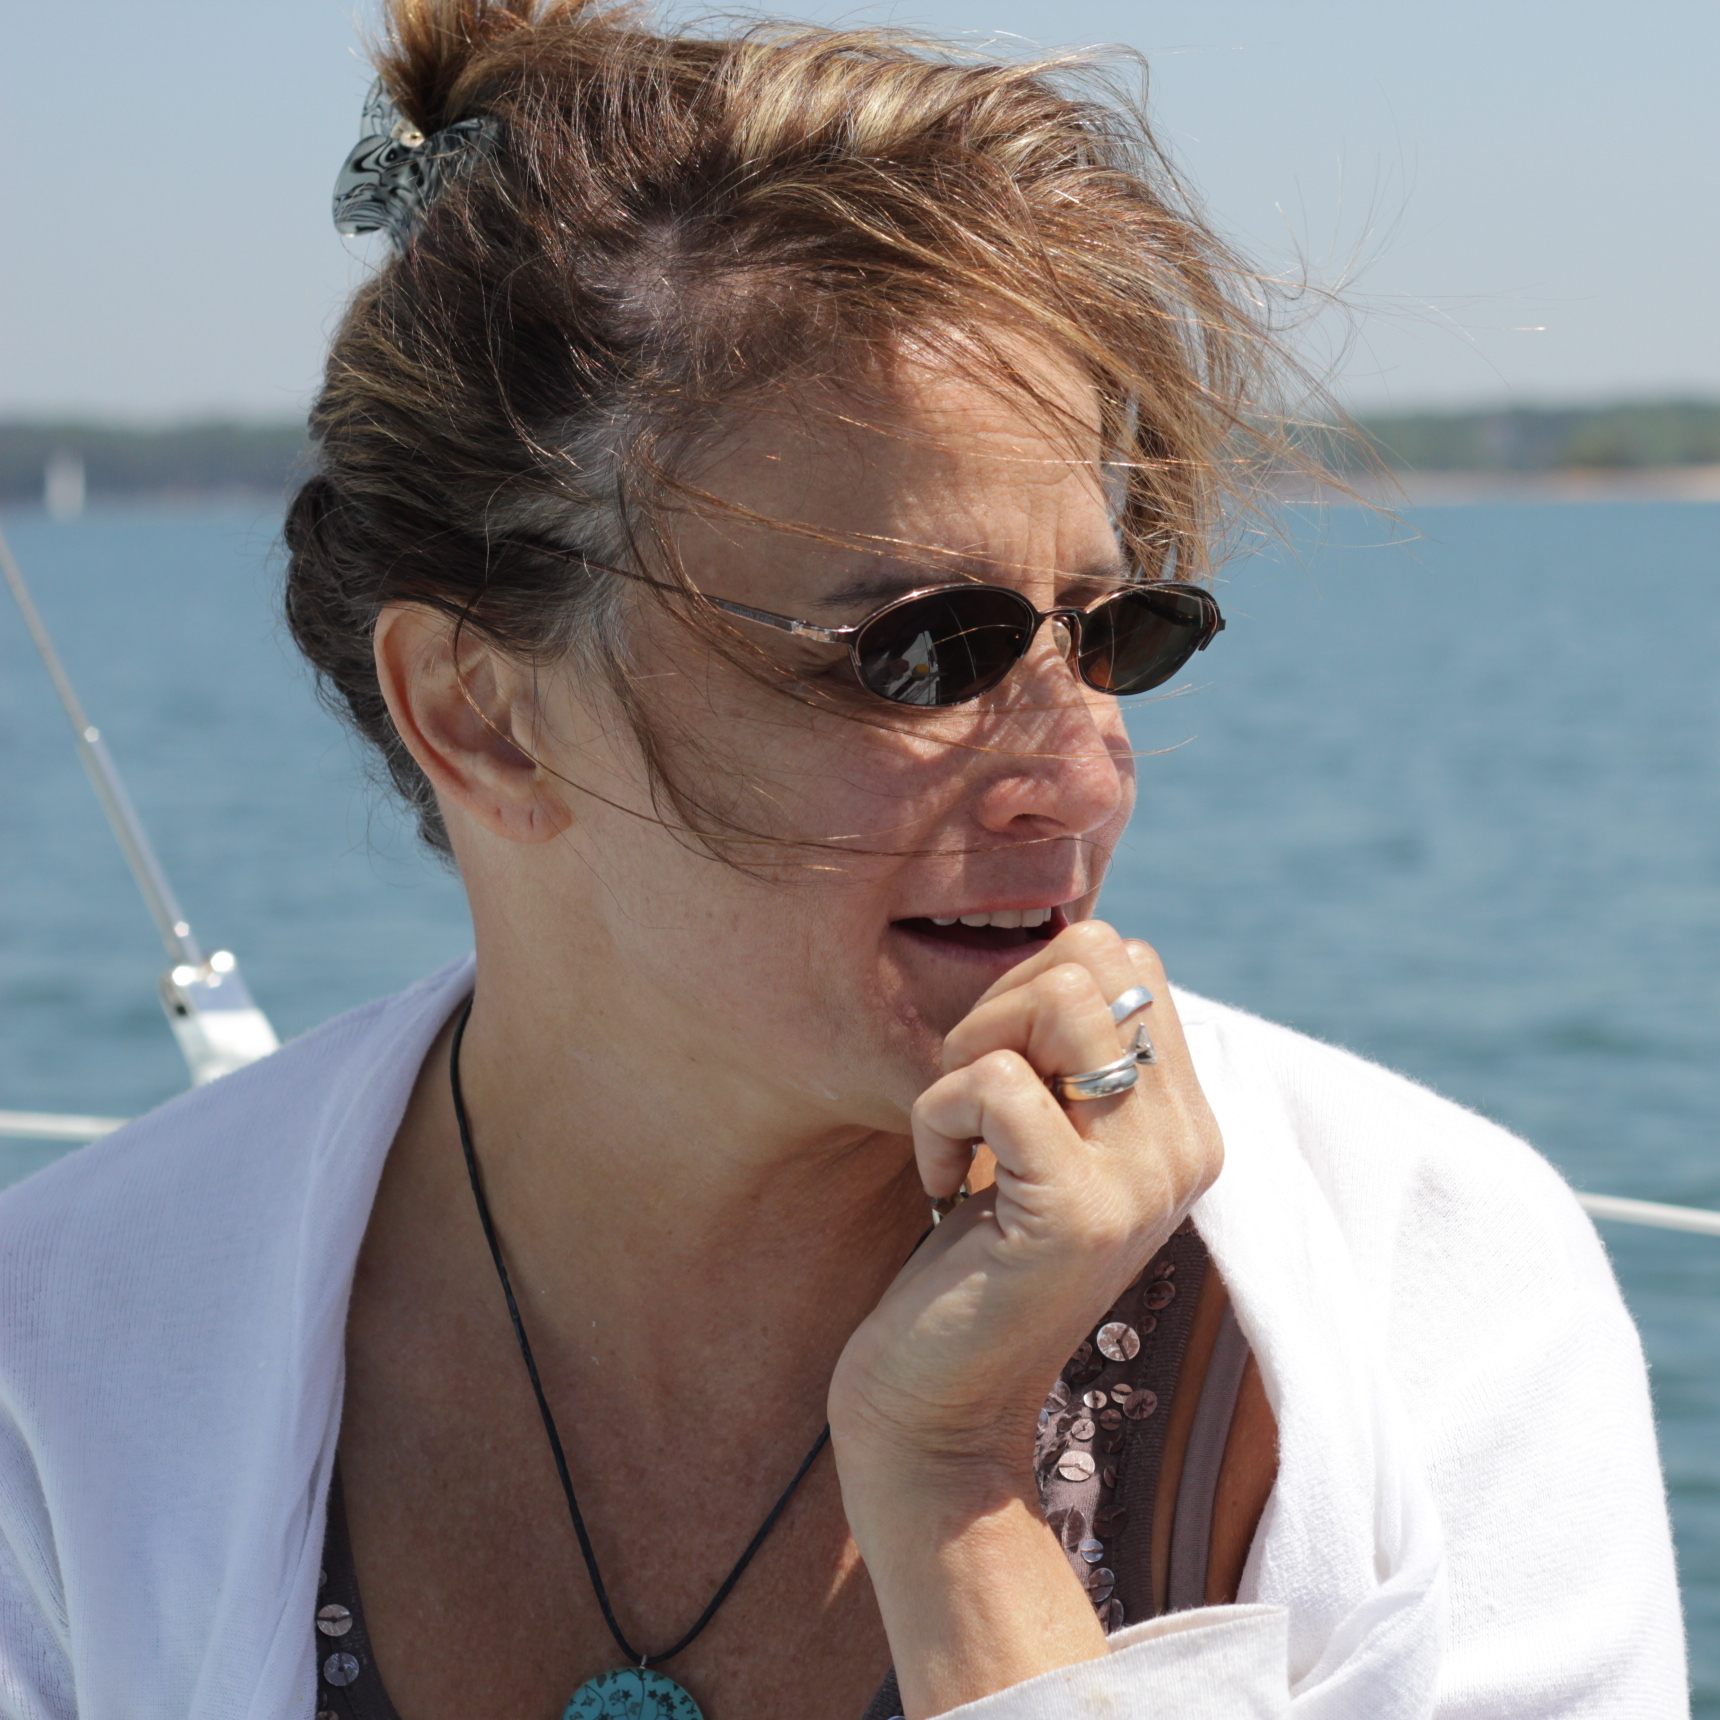 Linda Duvoisin